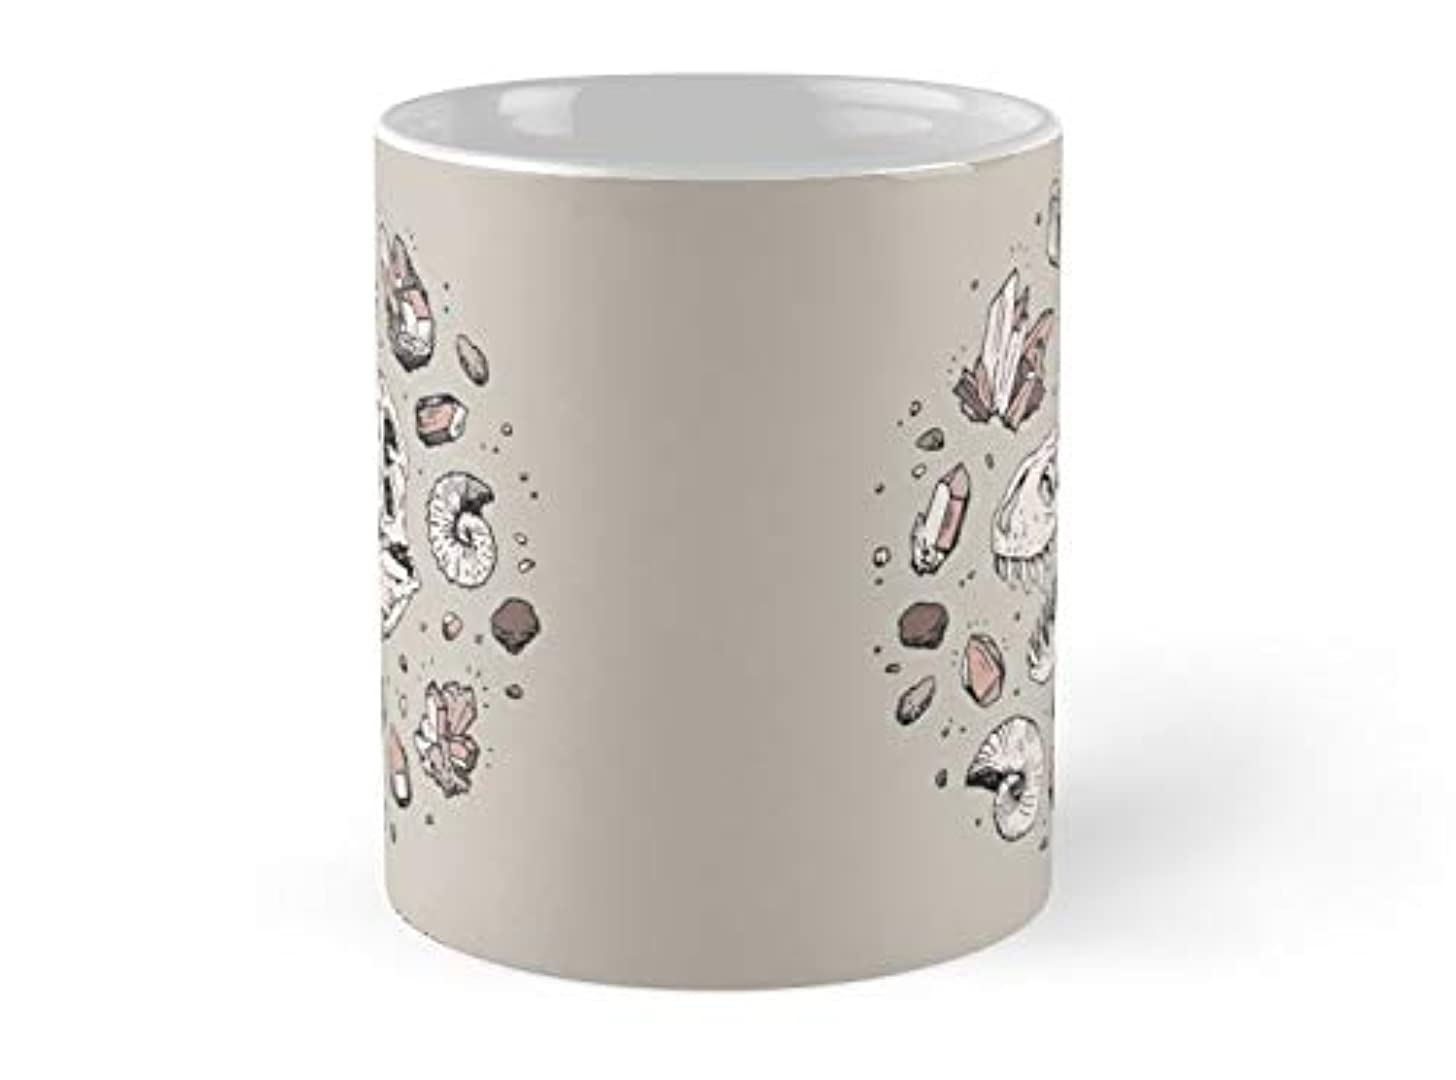 Georex Vortex Rose Quartz 11oz Mug - Best gift for family friends